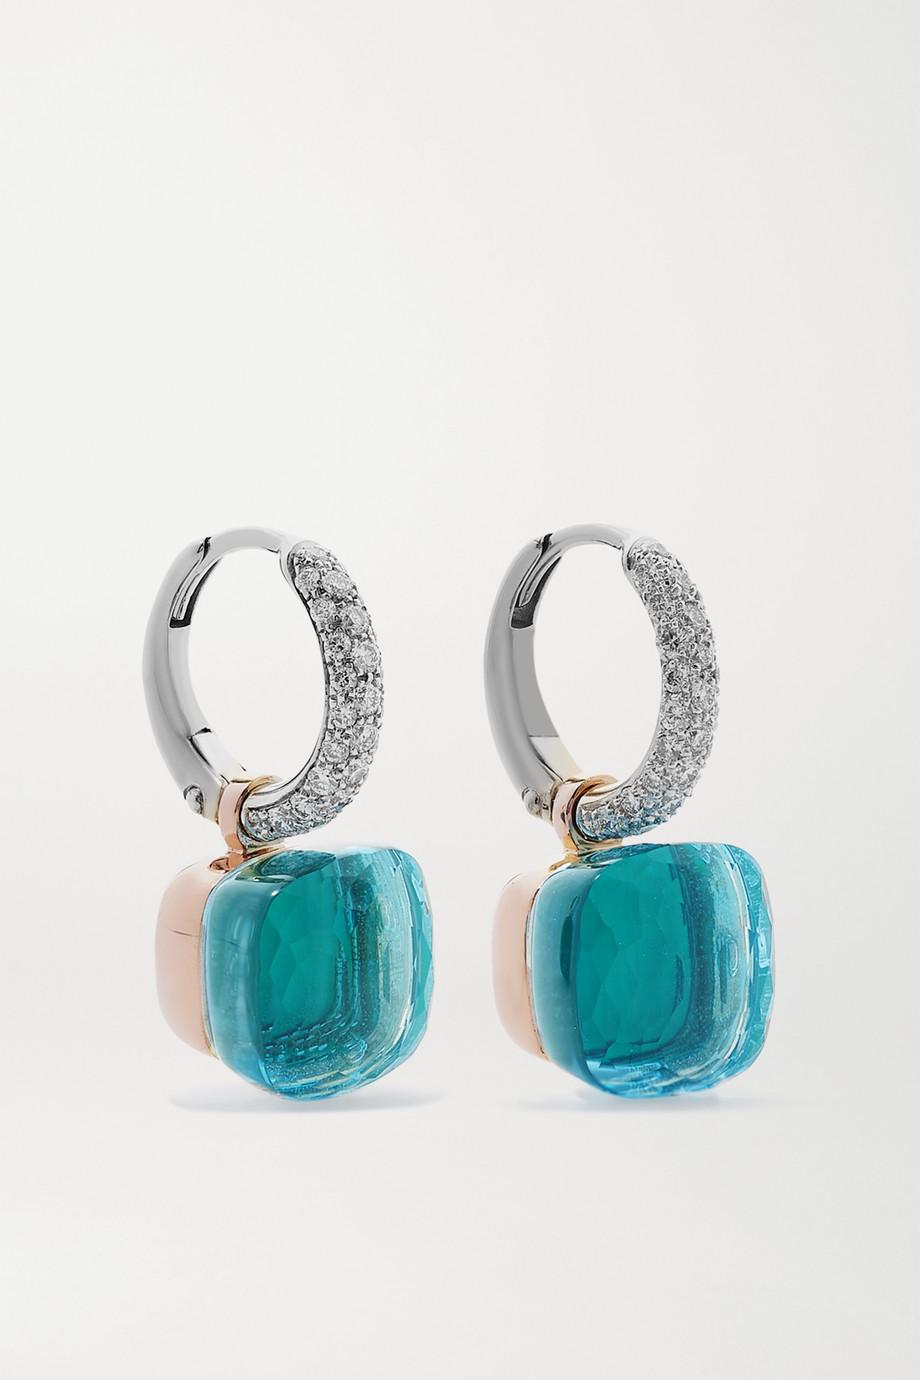 Pomellato Nudo 18-karat white and rose gold multi-stone earrings